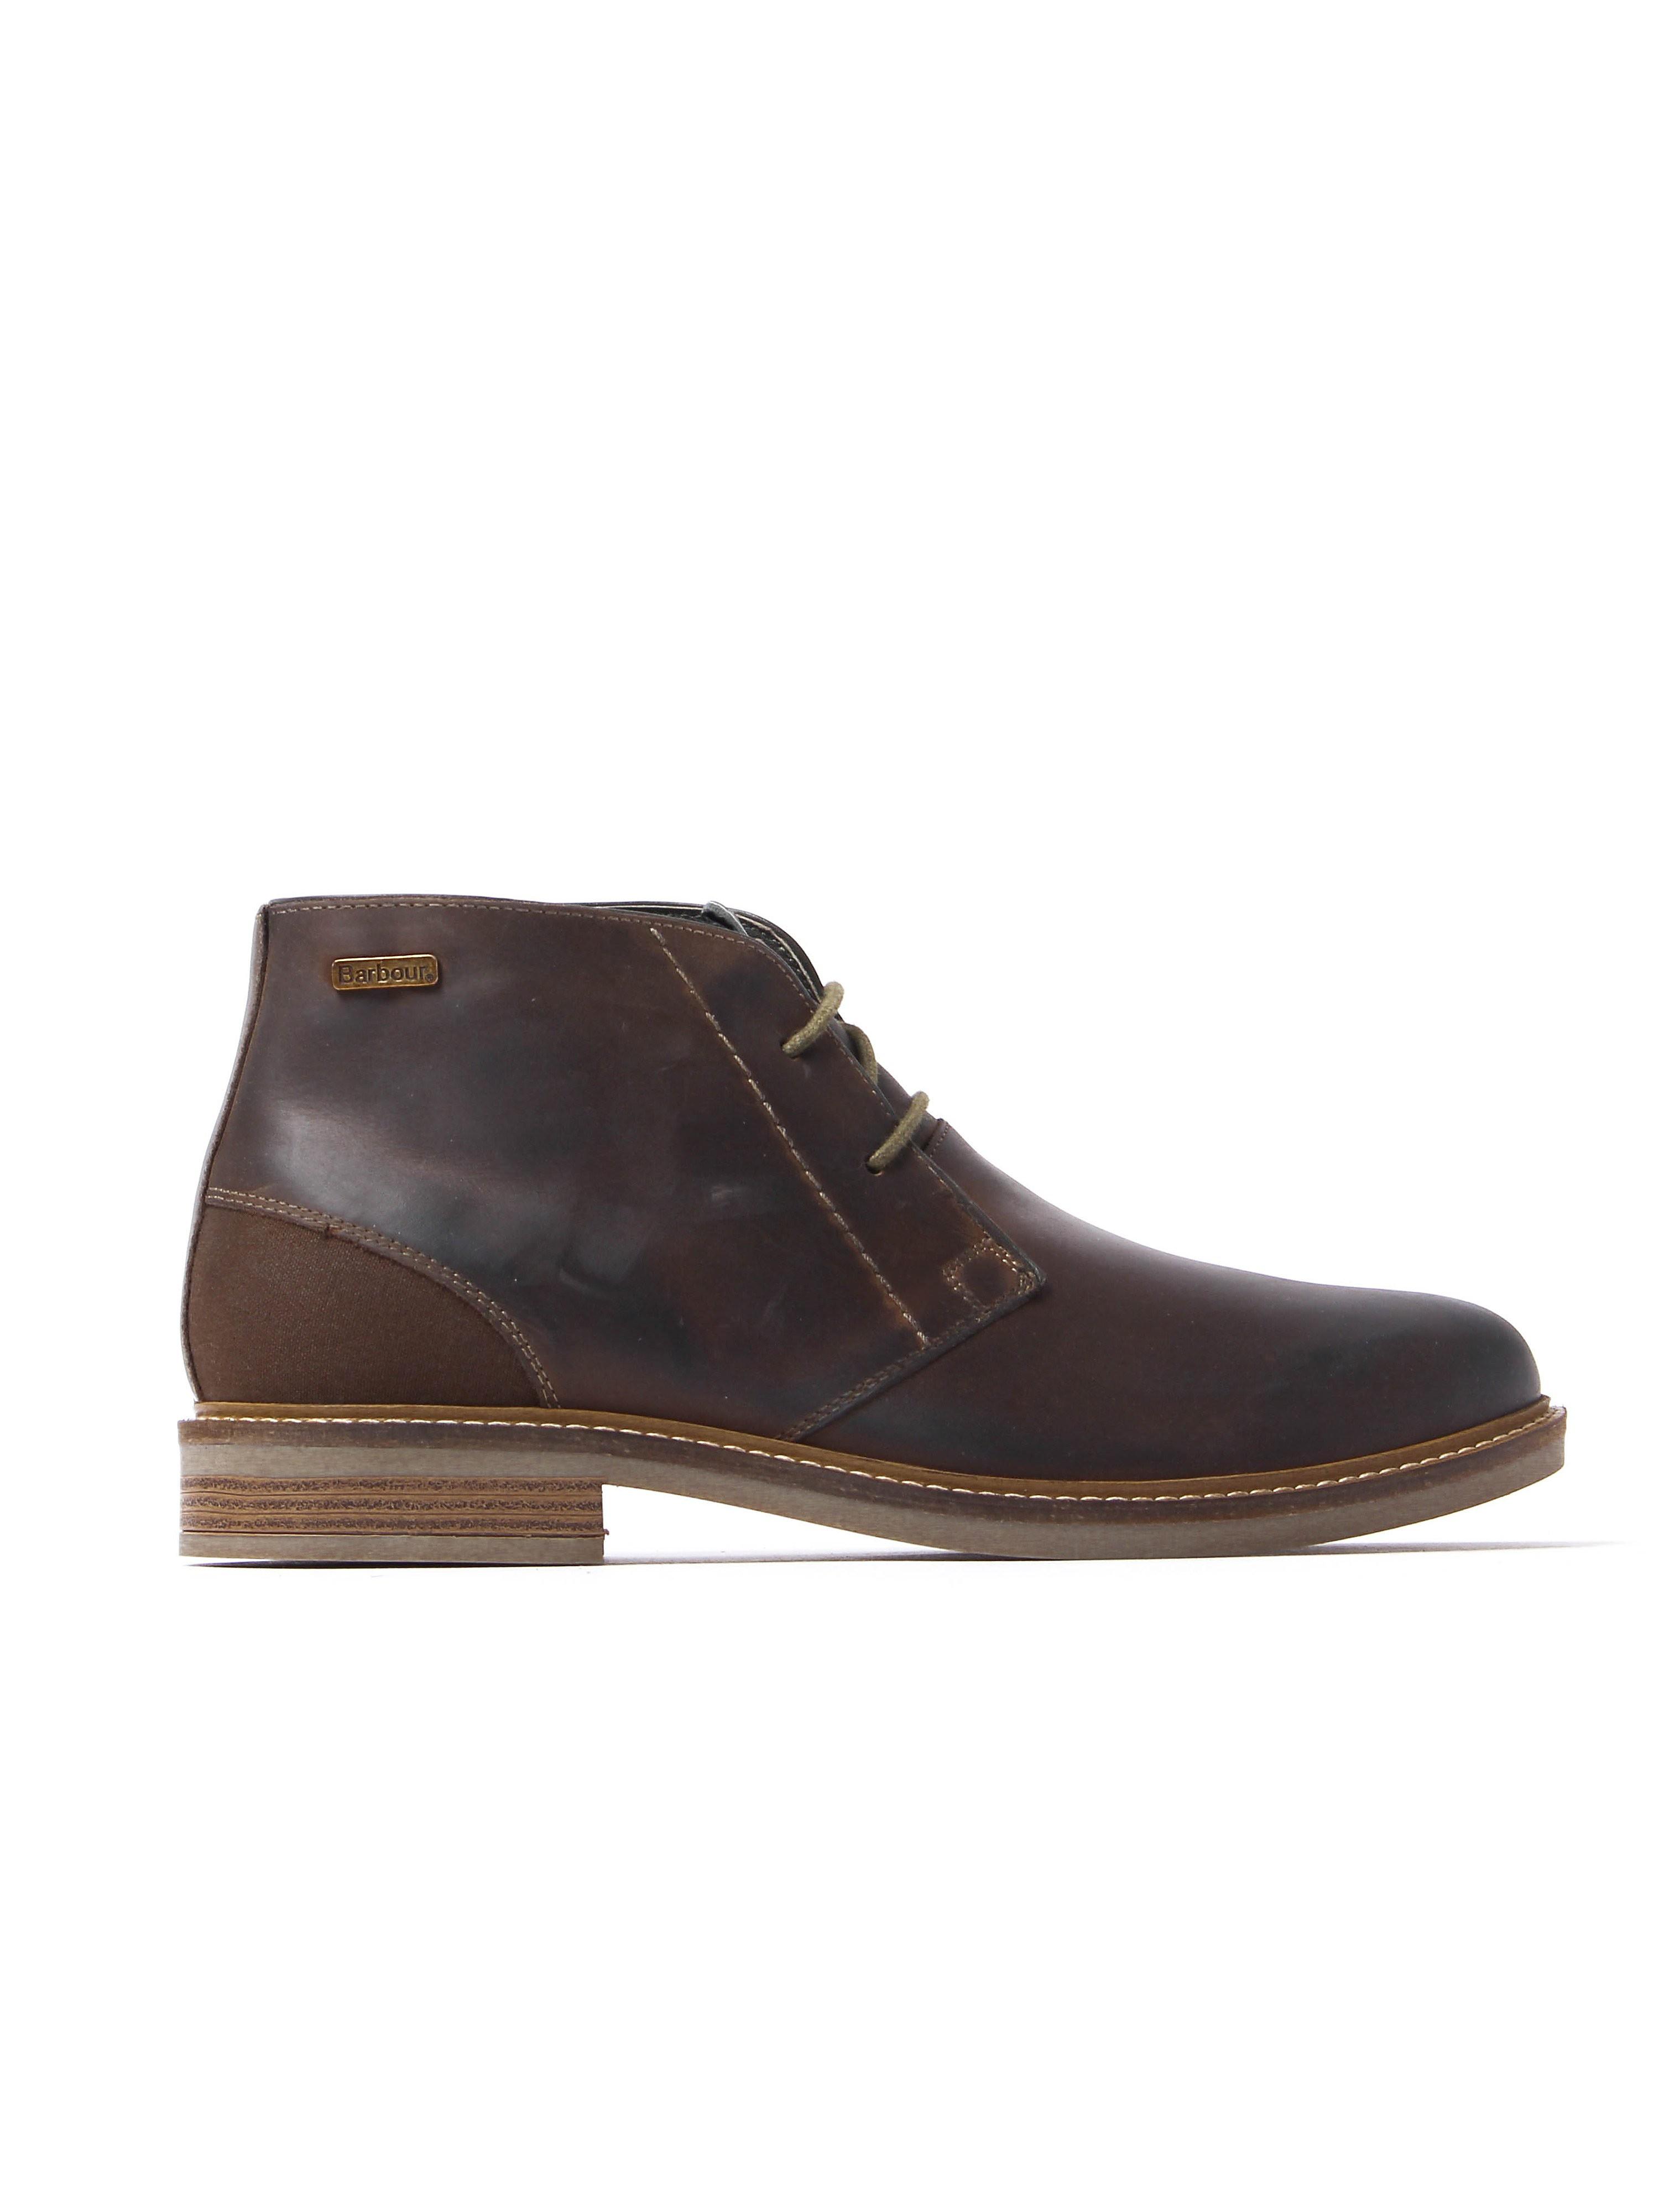 Barbour Men's Readhead Chukka Boots - Choco Nubuck